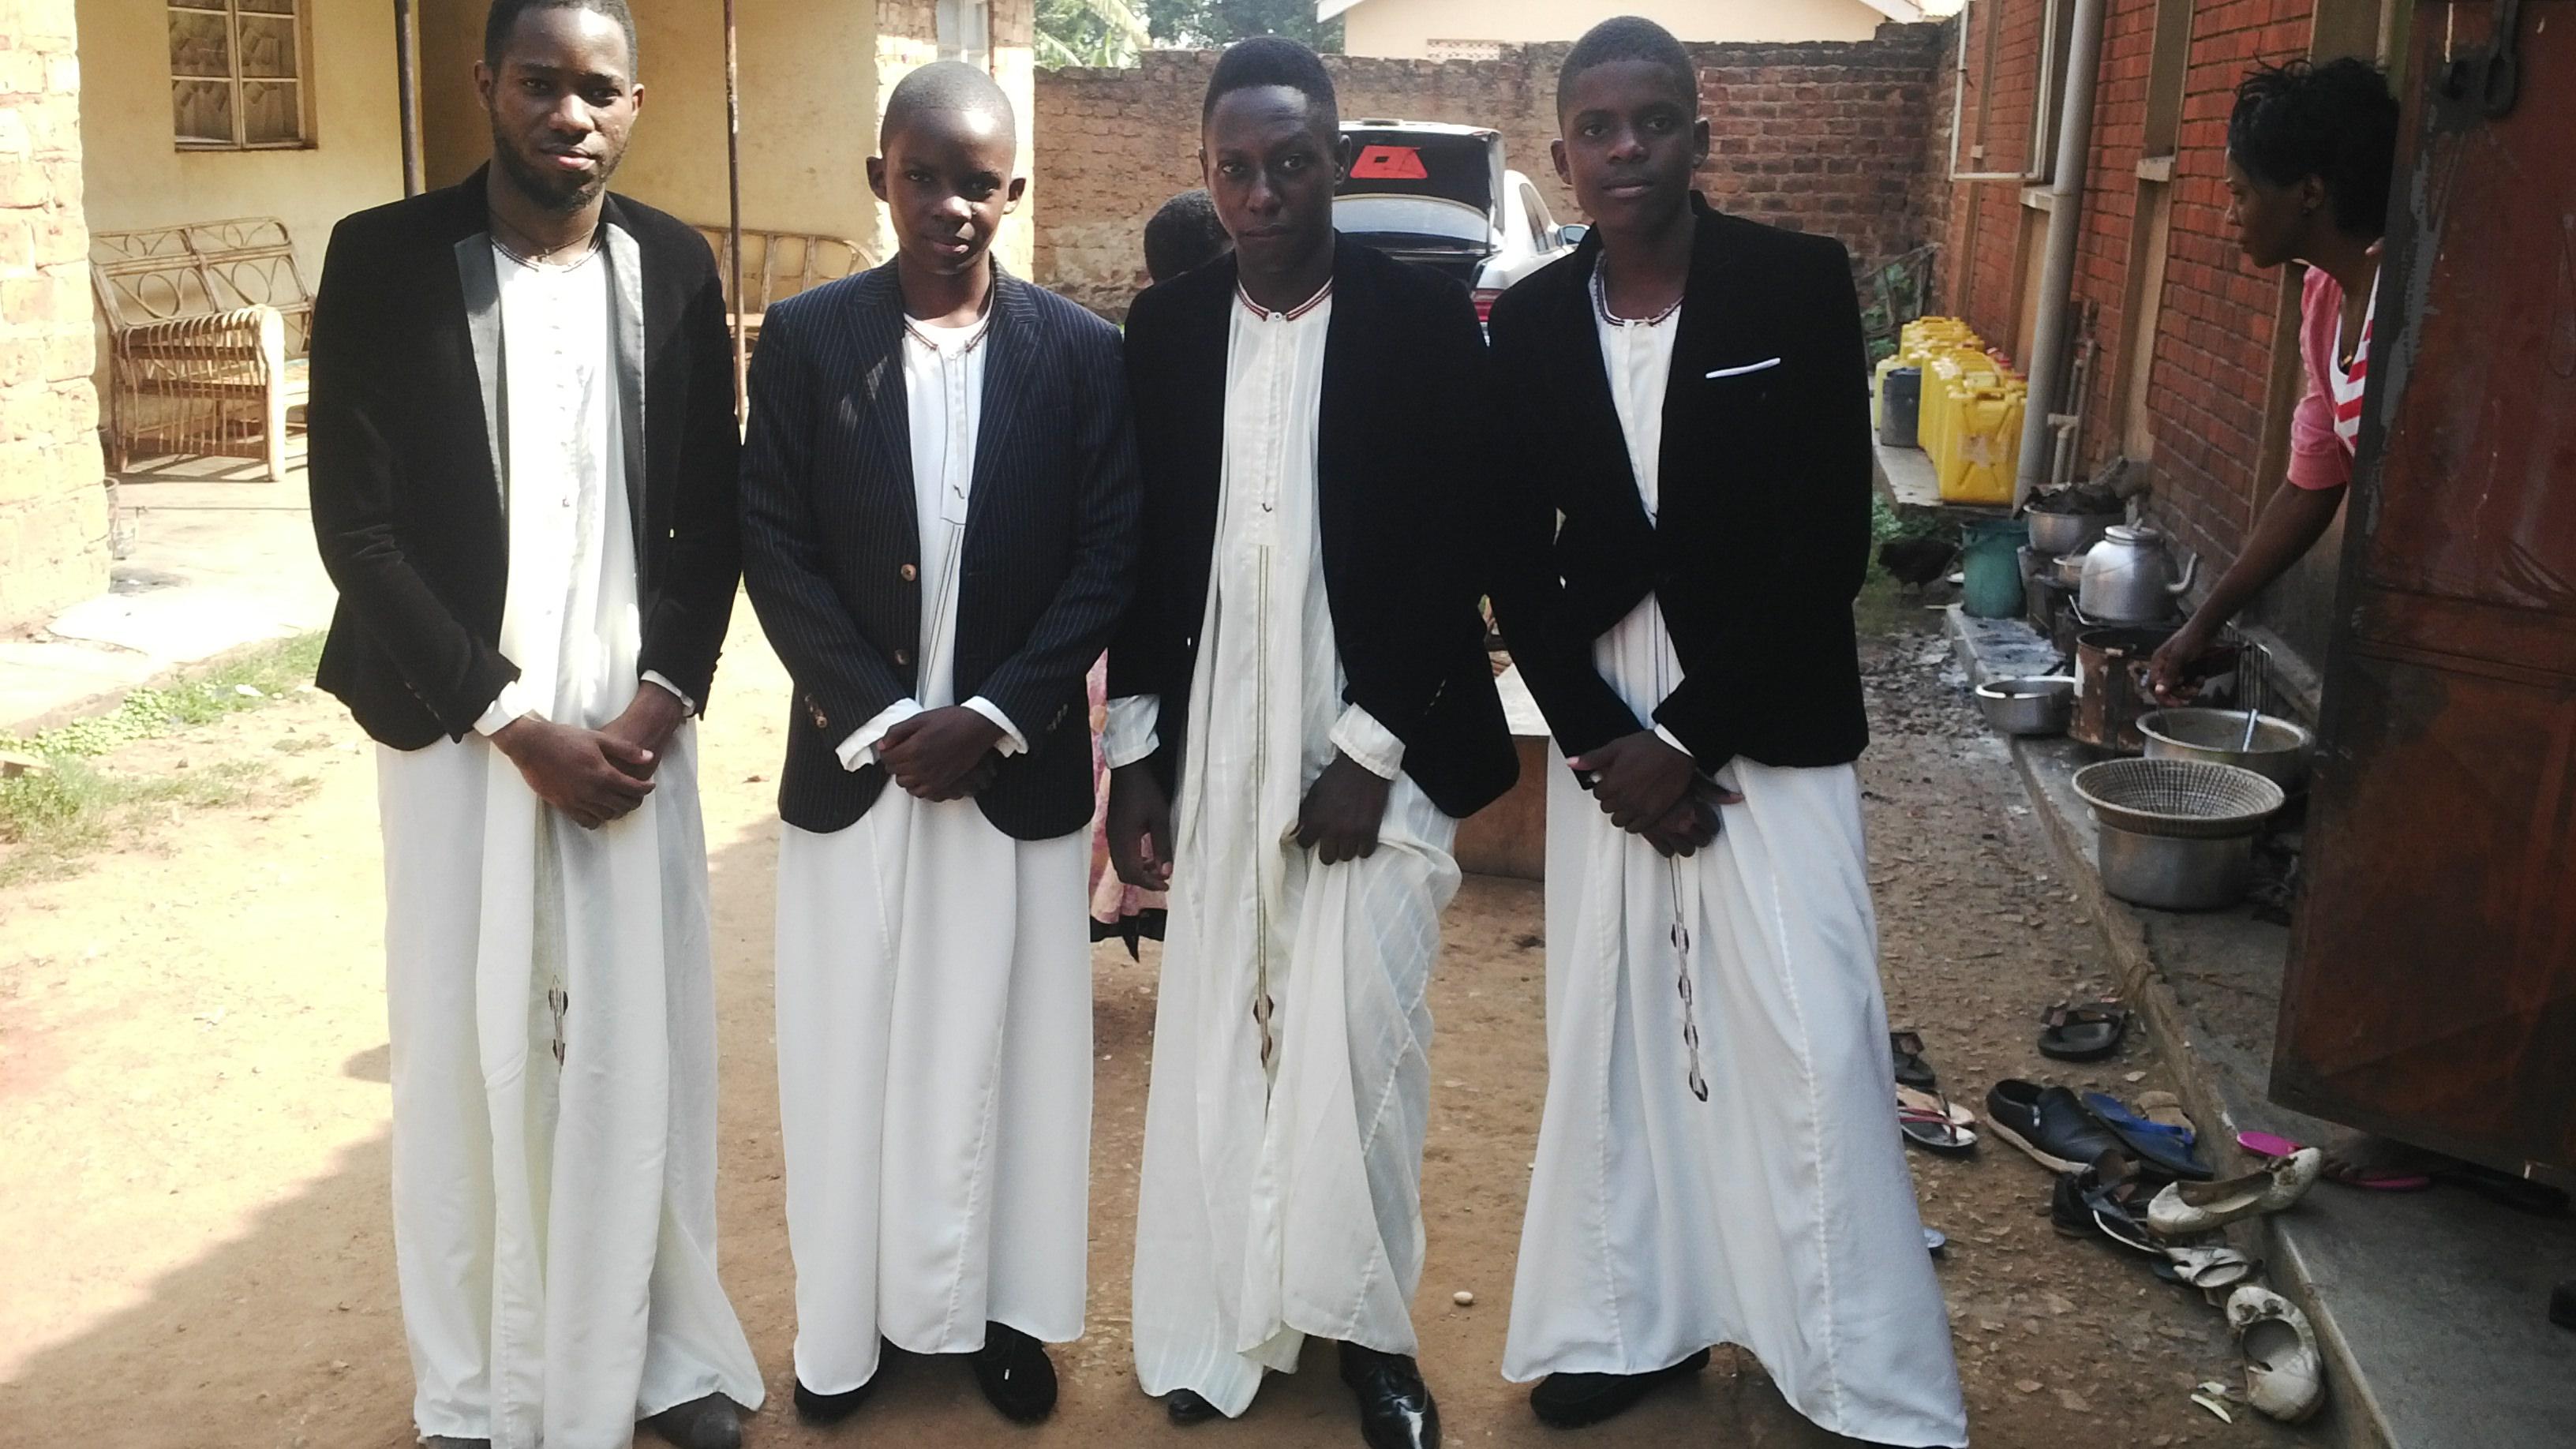 File:TRADITIONAL WEDDING KANZU OR CLOTH IN UGANDA.jpg - Wikimedia ...